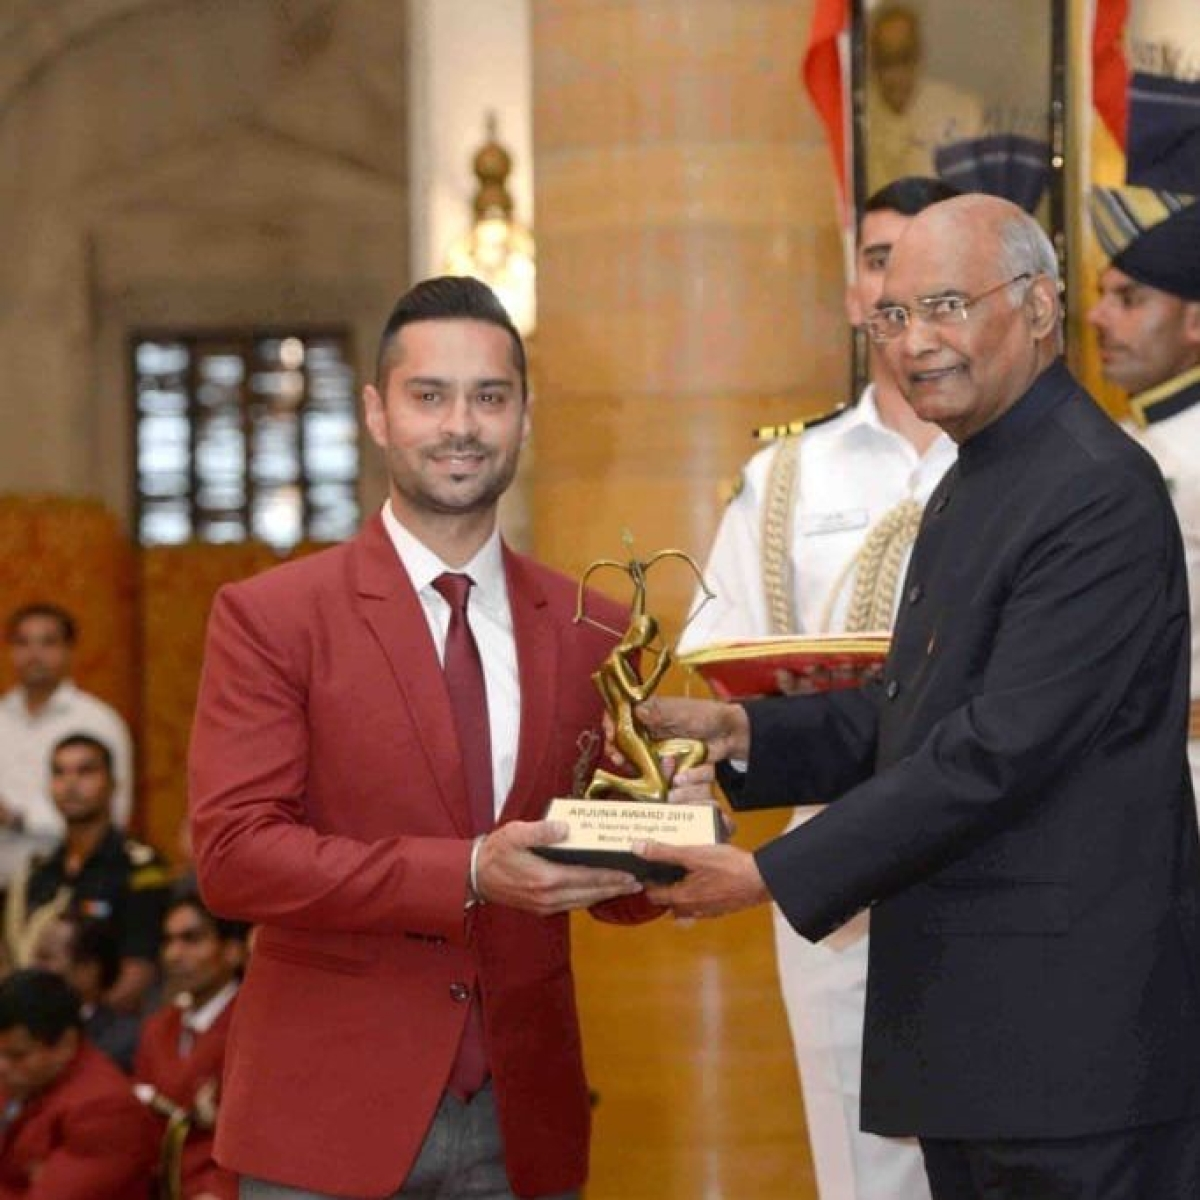 FMSCI denounces reports on inconsistency in Gaurav Gill's Arjuna Award